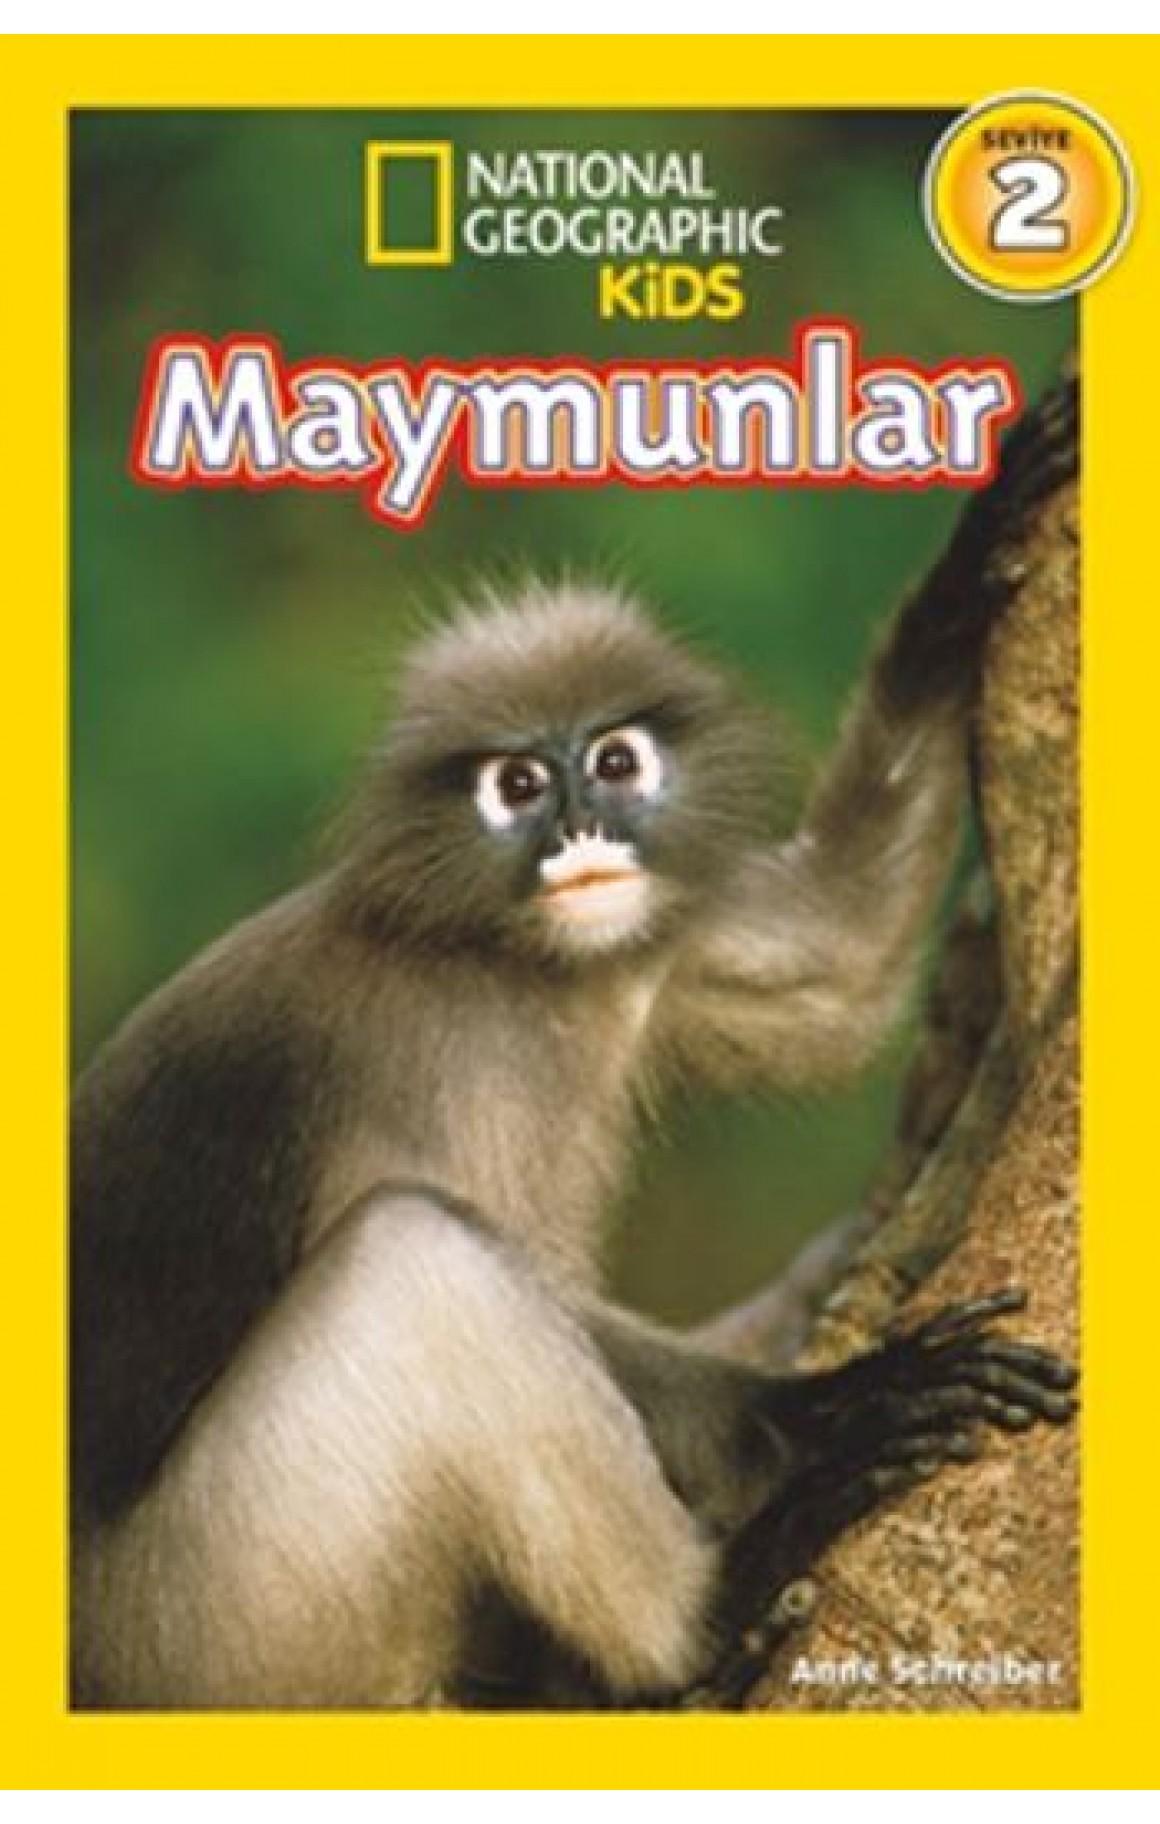 National Geographic Kids - Maymunlar